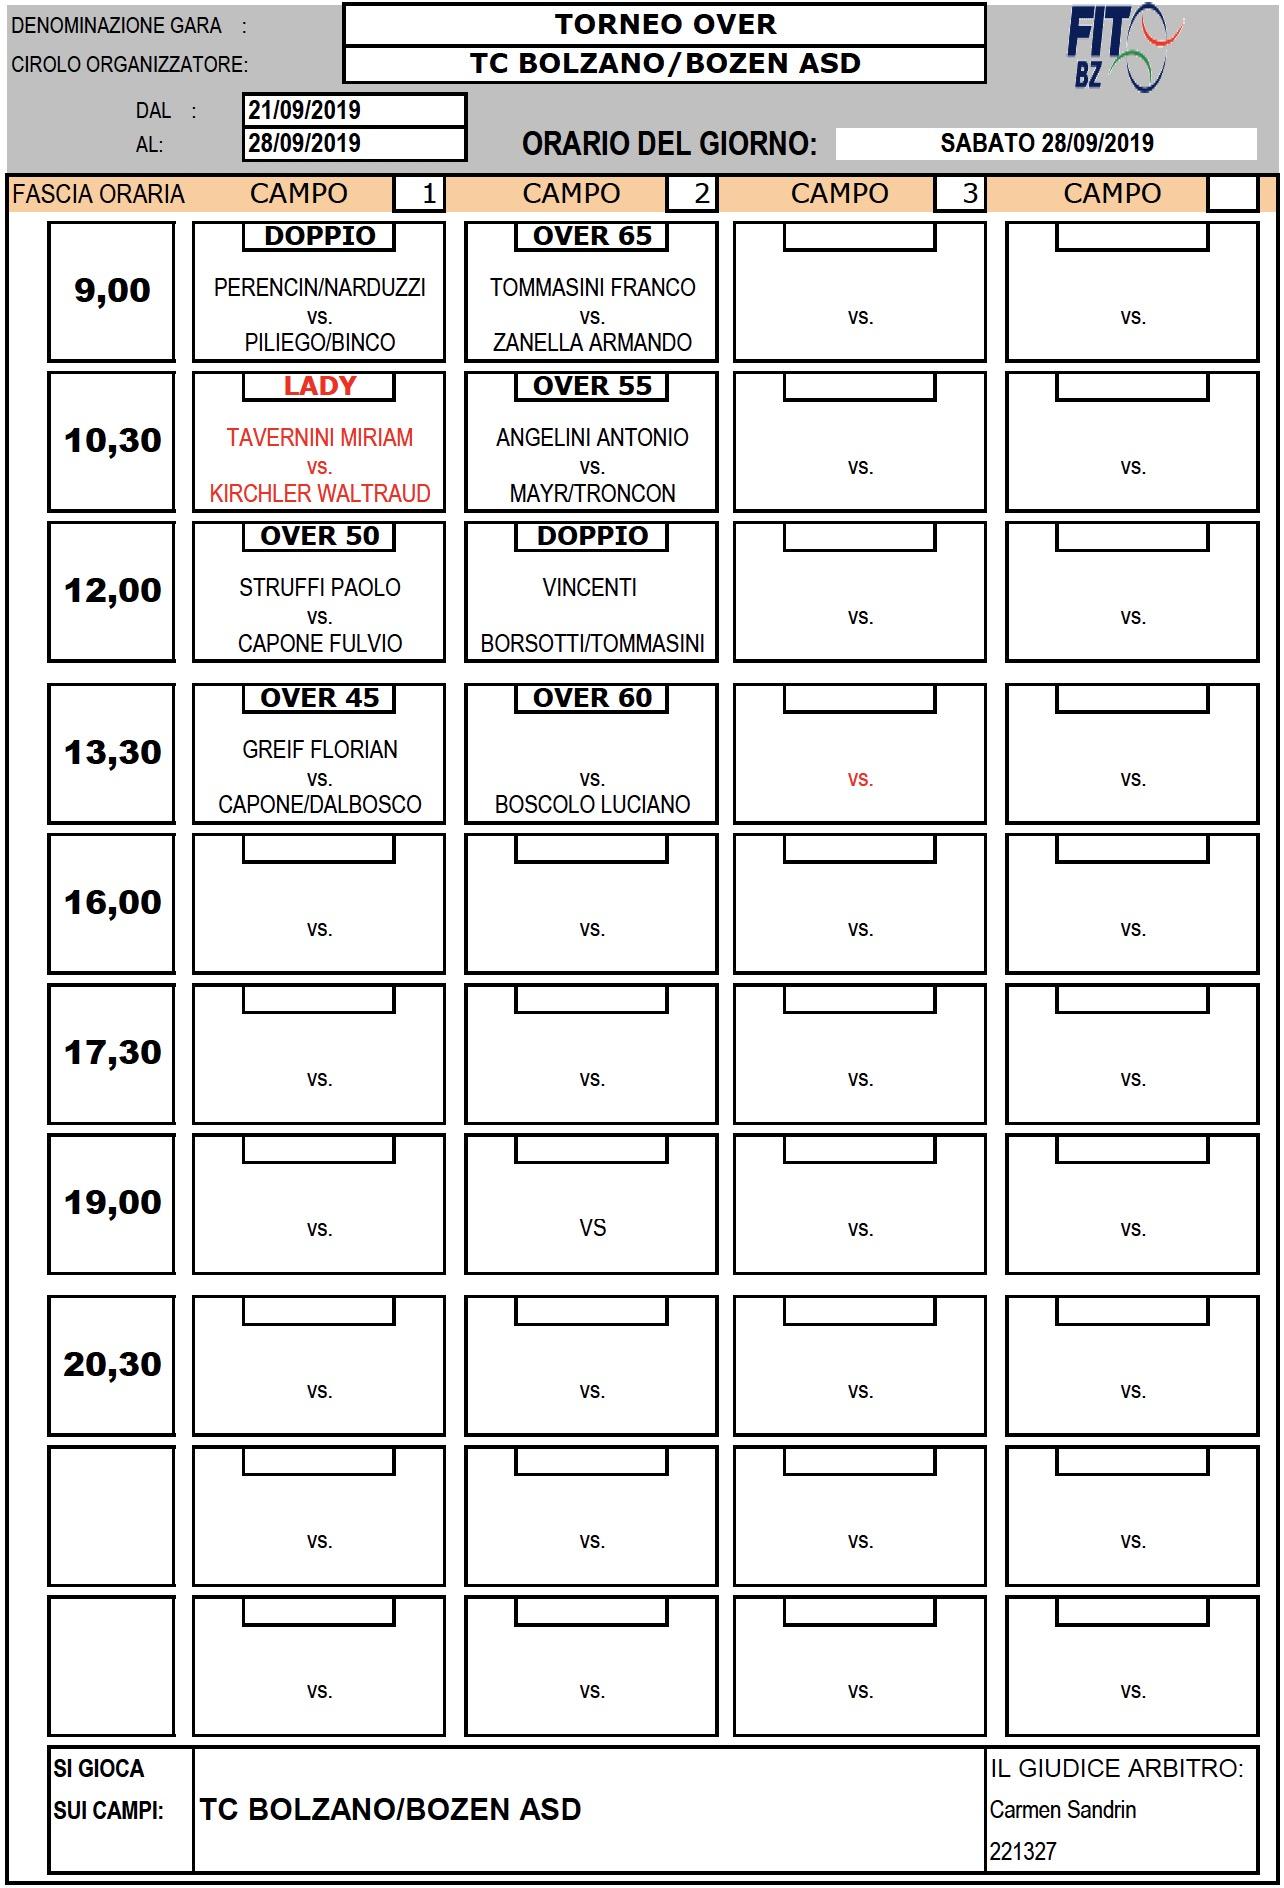 2019-torneo-over-orario-sabato